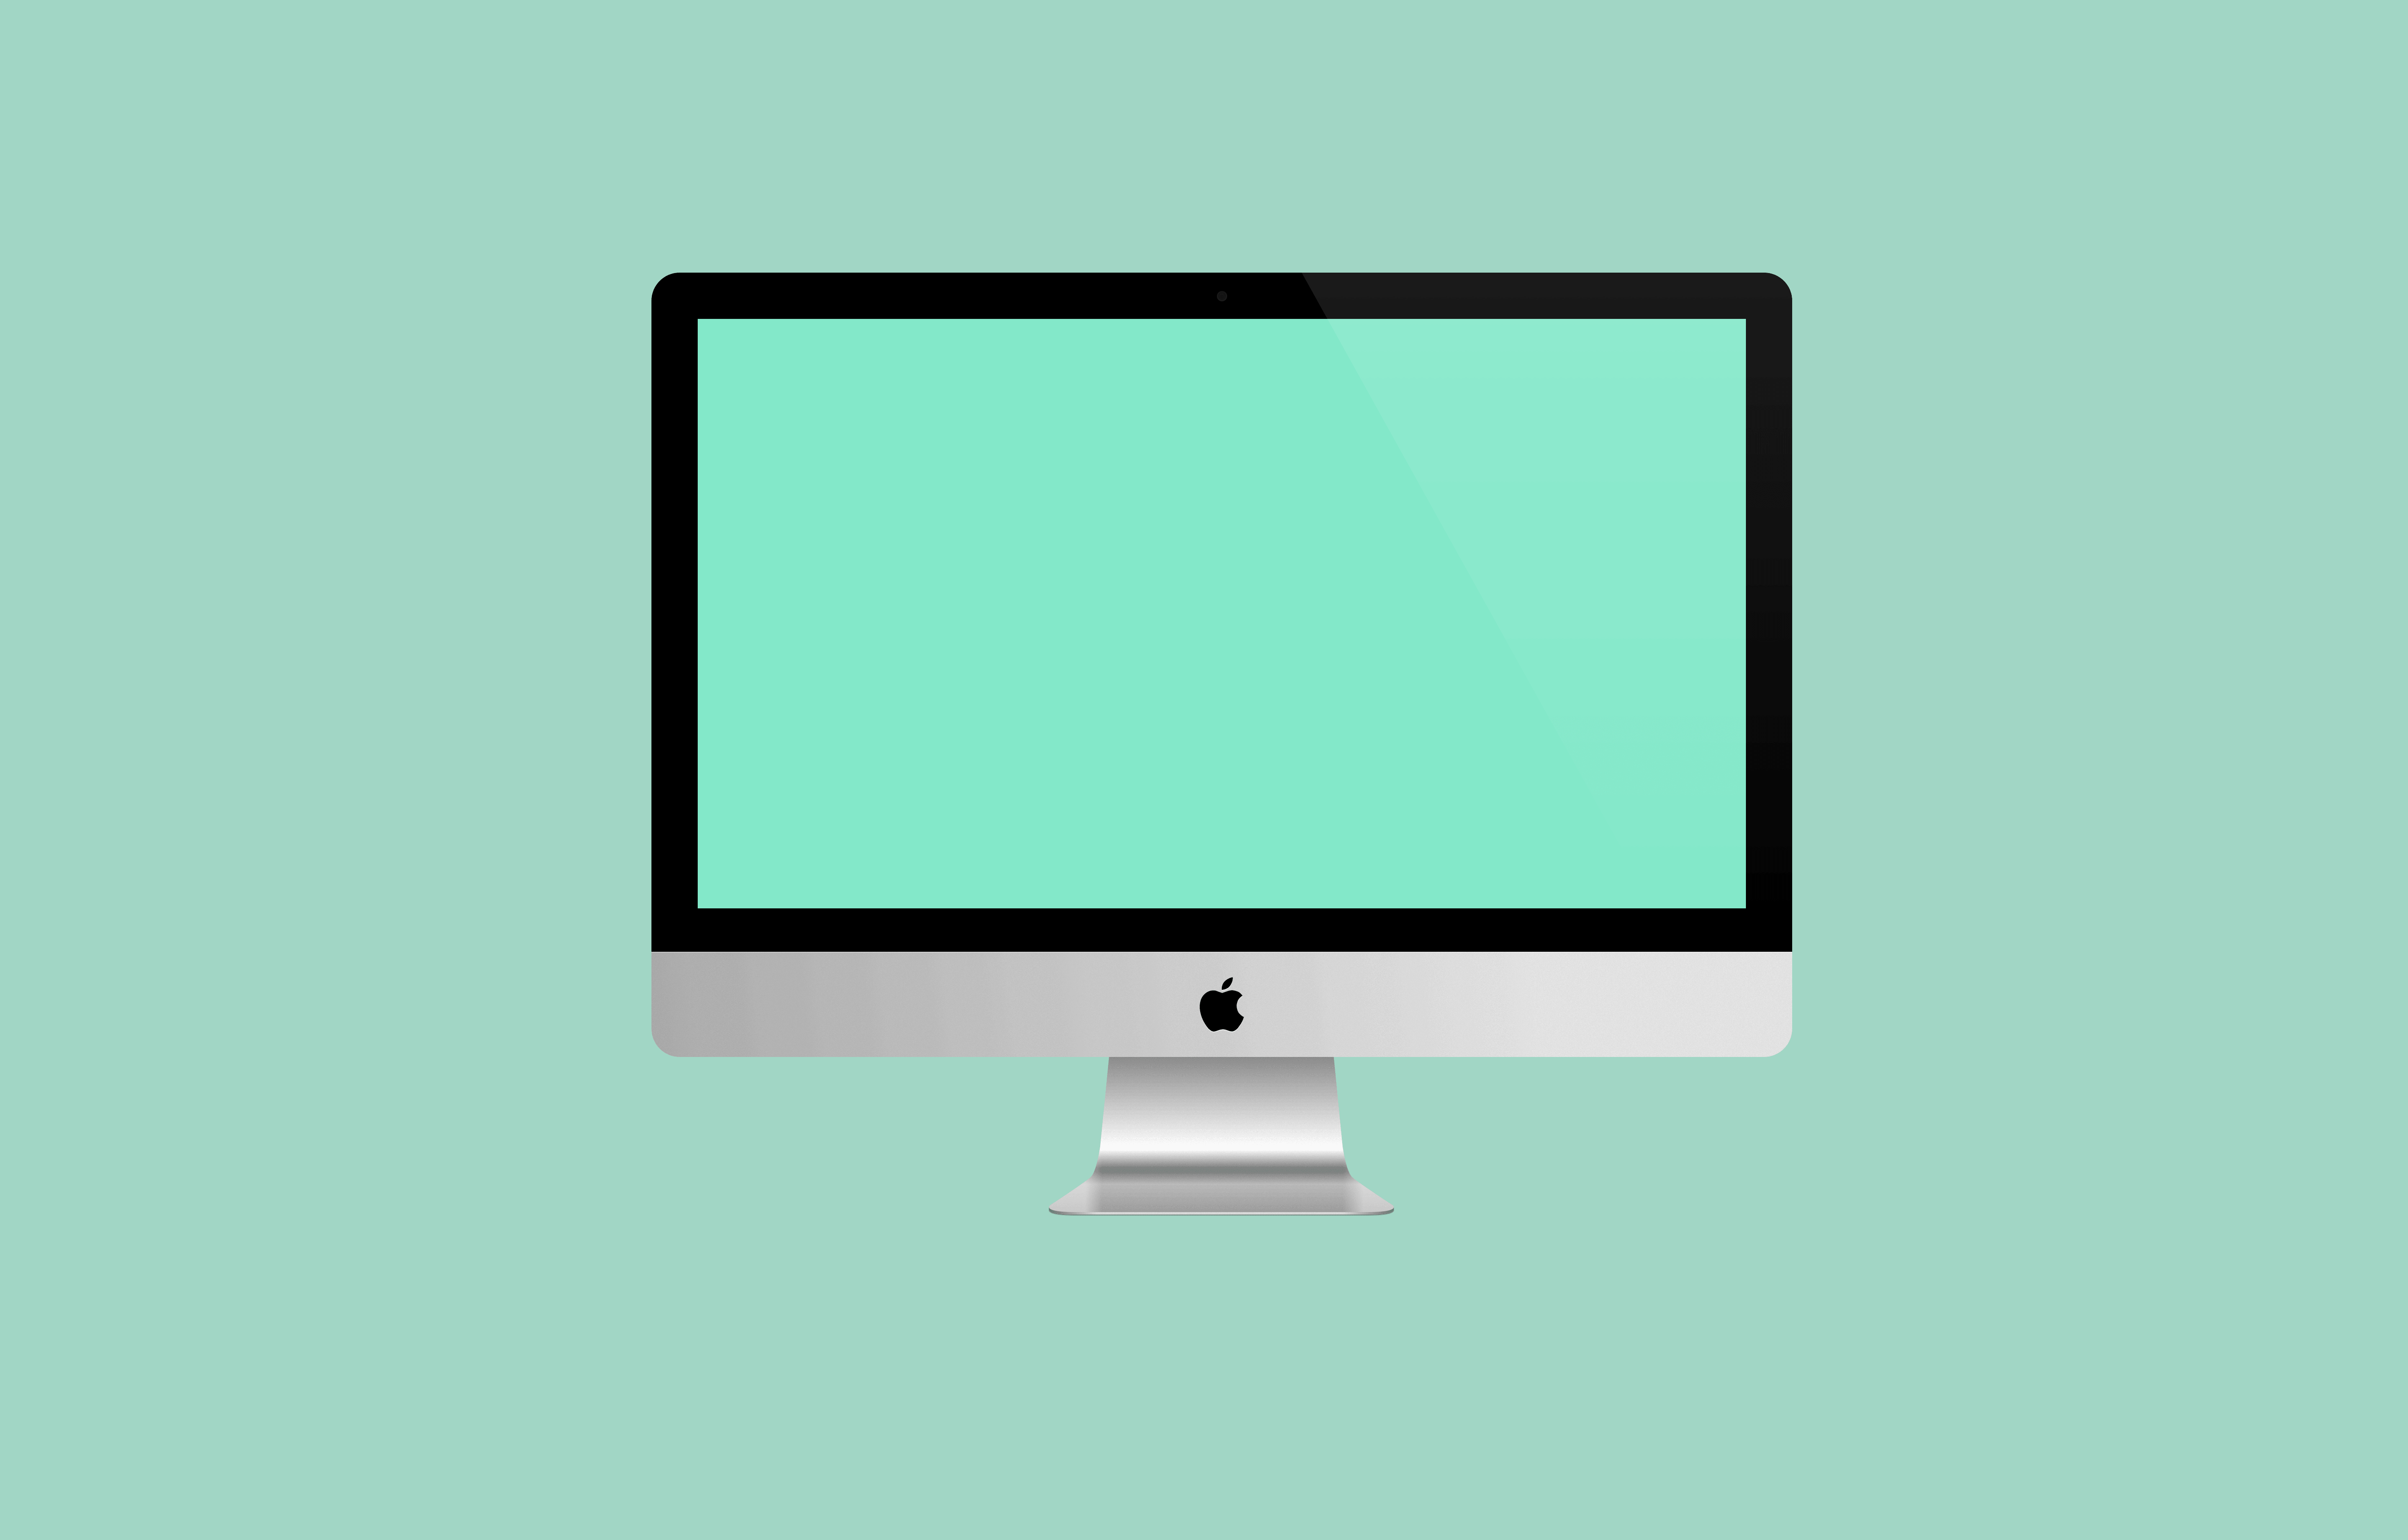 Free Sketch iMac Mockup for Sketch | Freebie